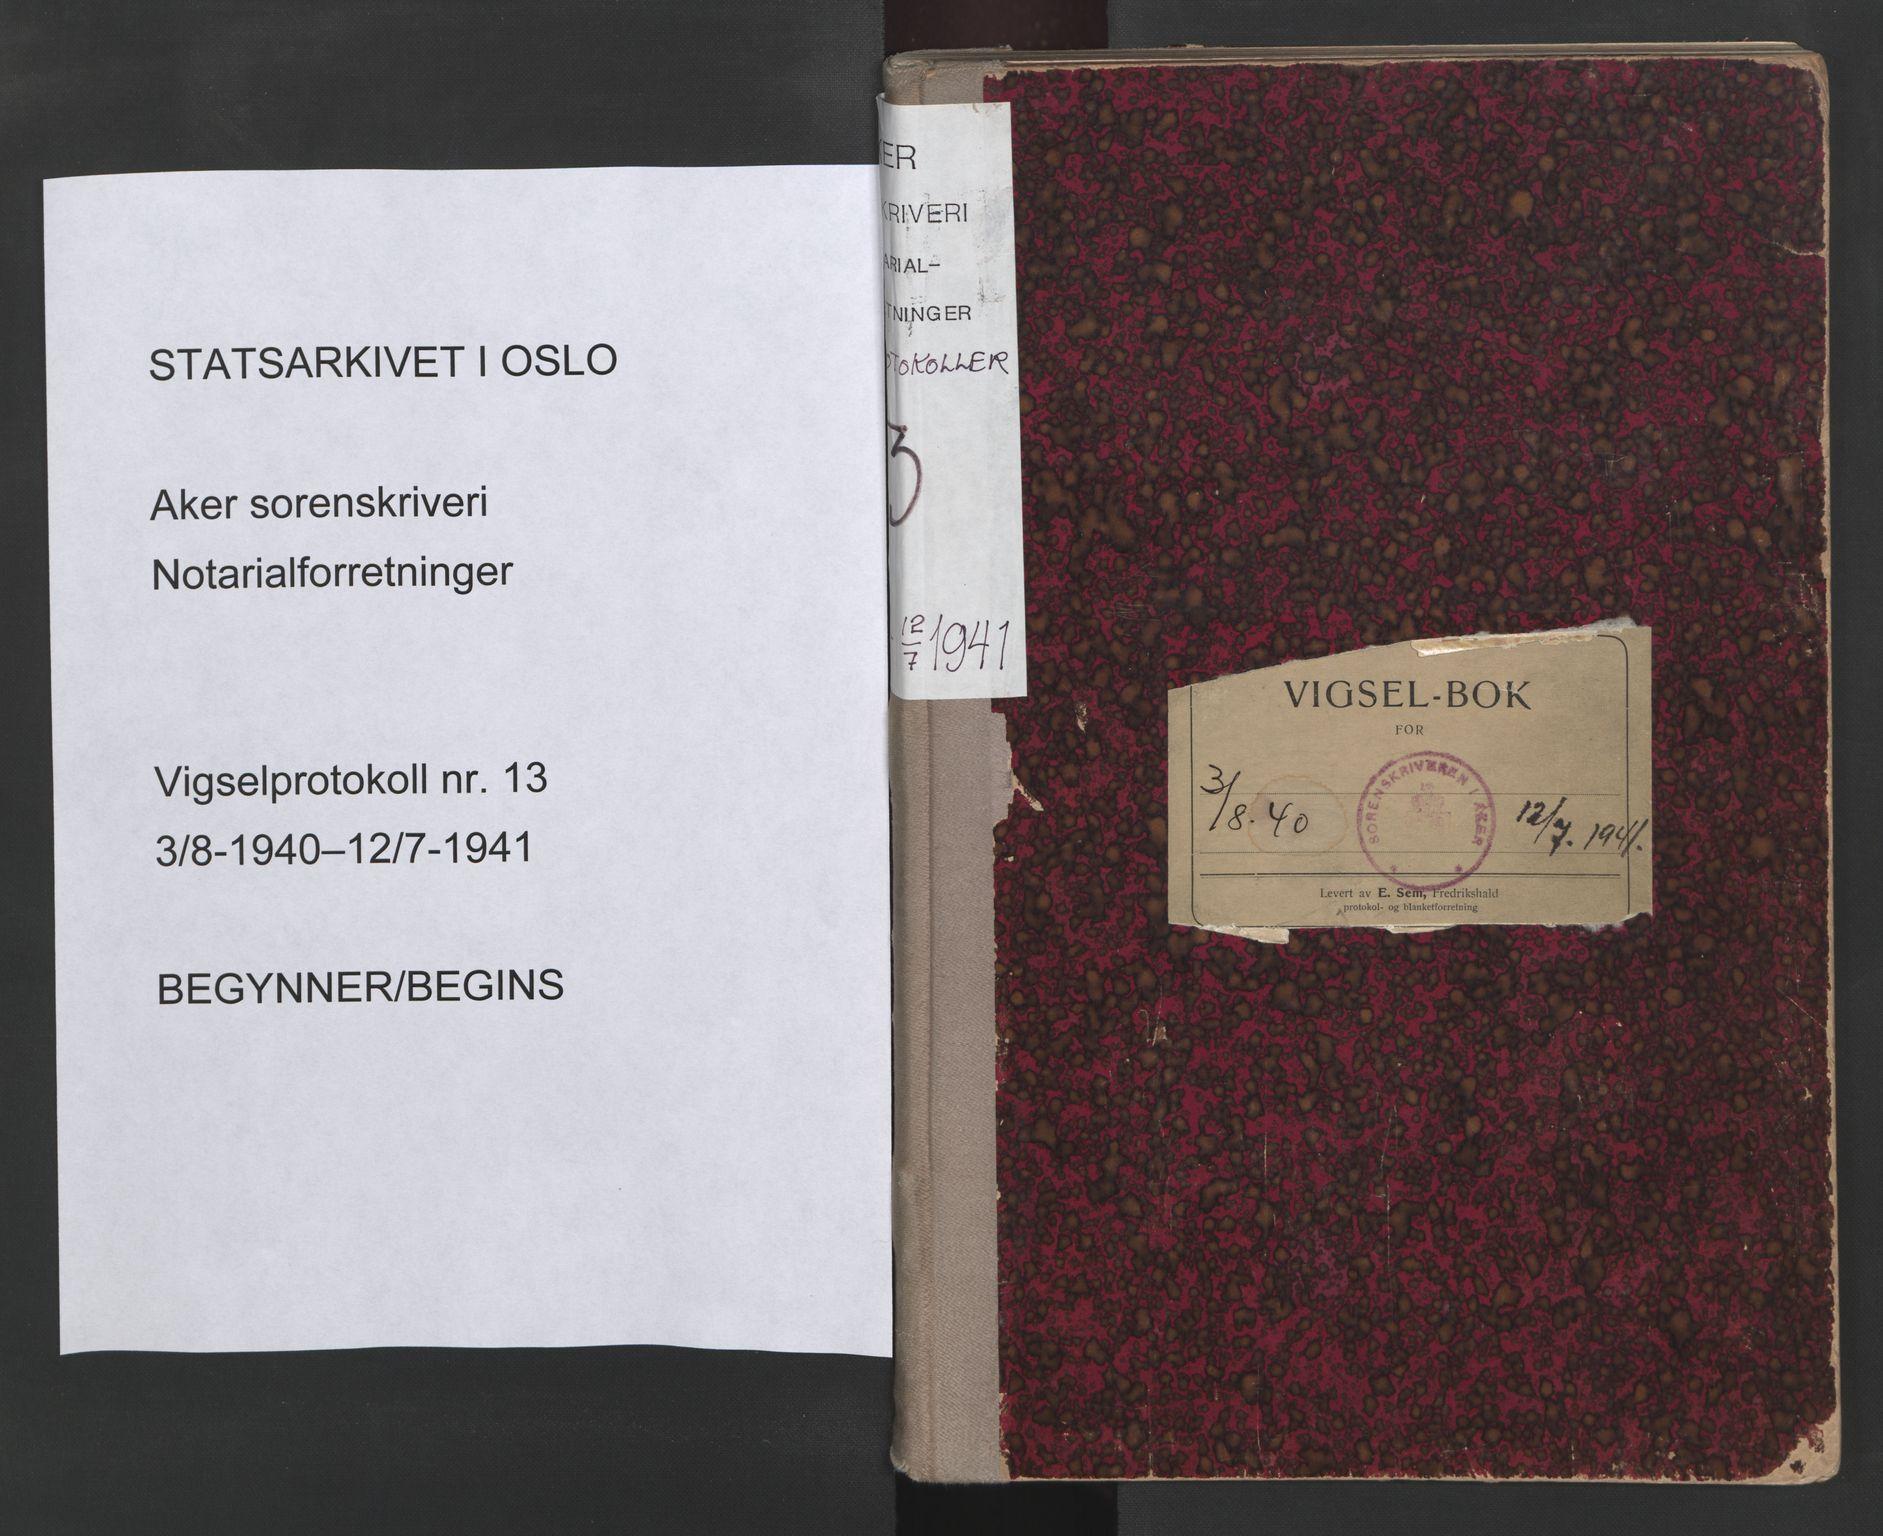 SAO, Aker sorenskriveri, L/Lc/Lcb/L0013: Vigselprotokoll, 1940-1941, s. upaginert